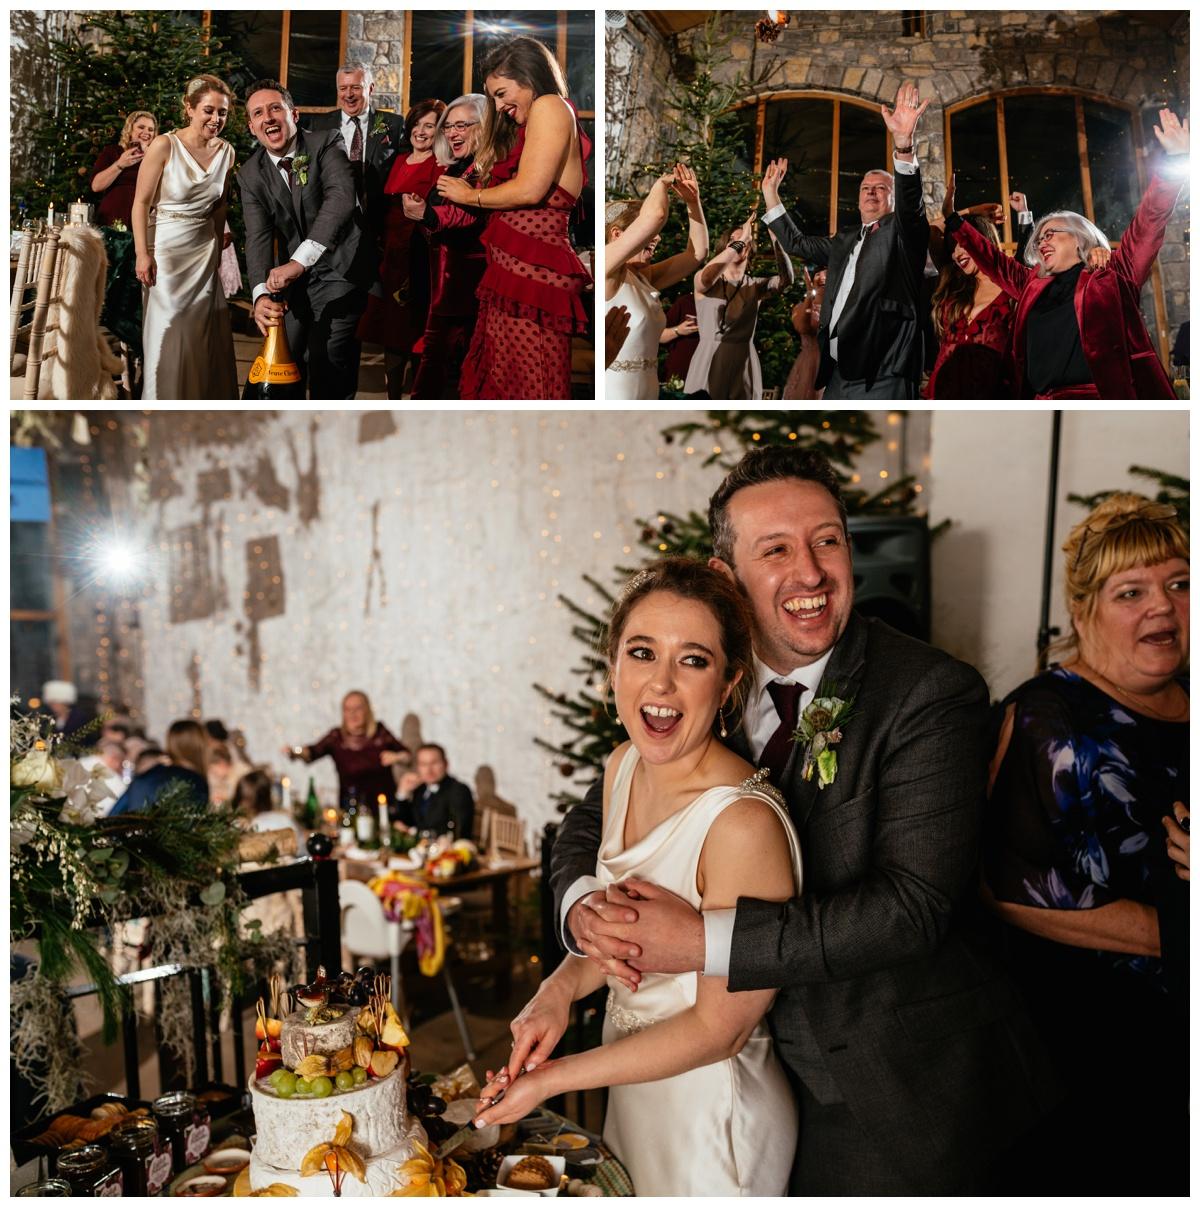 Carly Huw Rosedew Farm South Wales Wedding Photographer -OM- 028 - 35 mm 1-250 sec at f - 4.0 ISO 400_Spain Abroad Destination Wedding Photographers.jpg